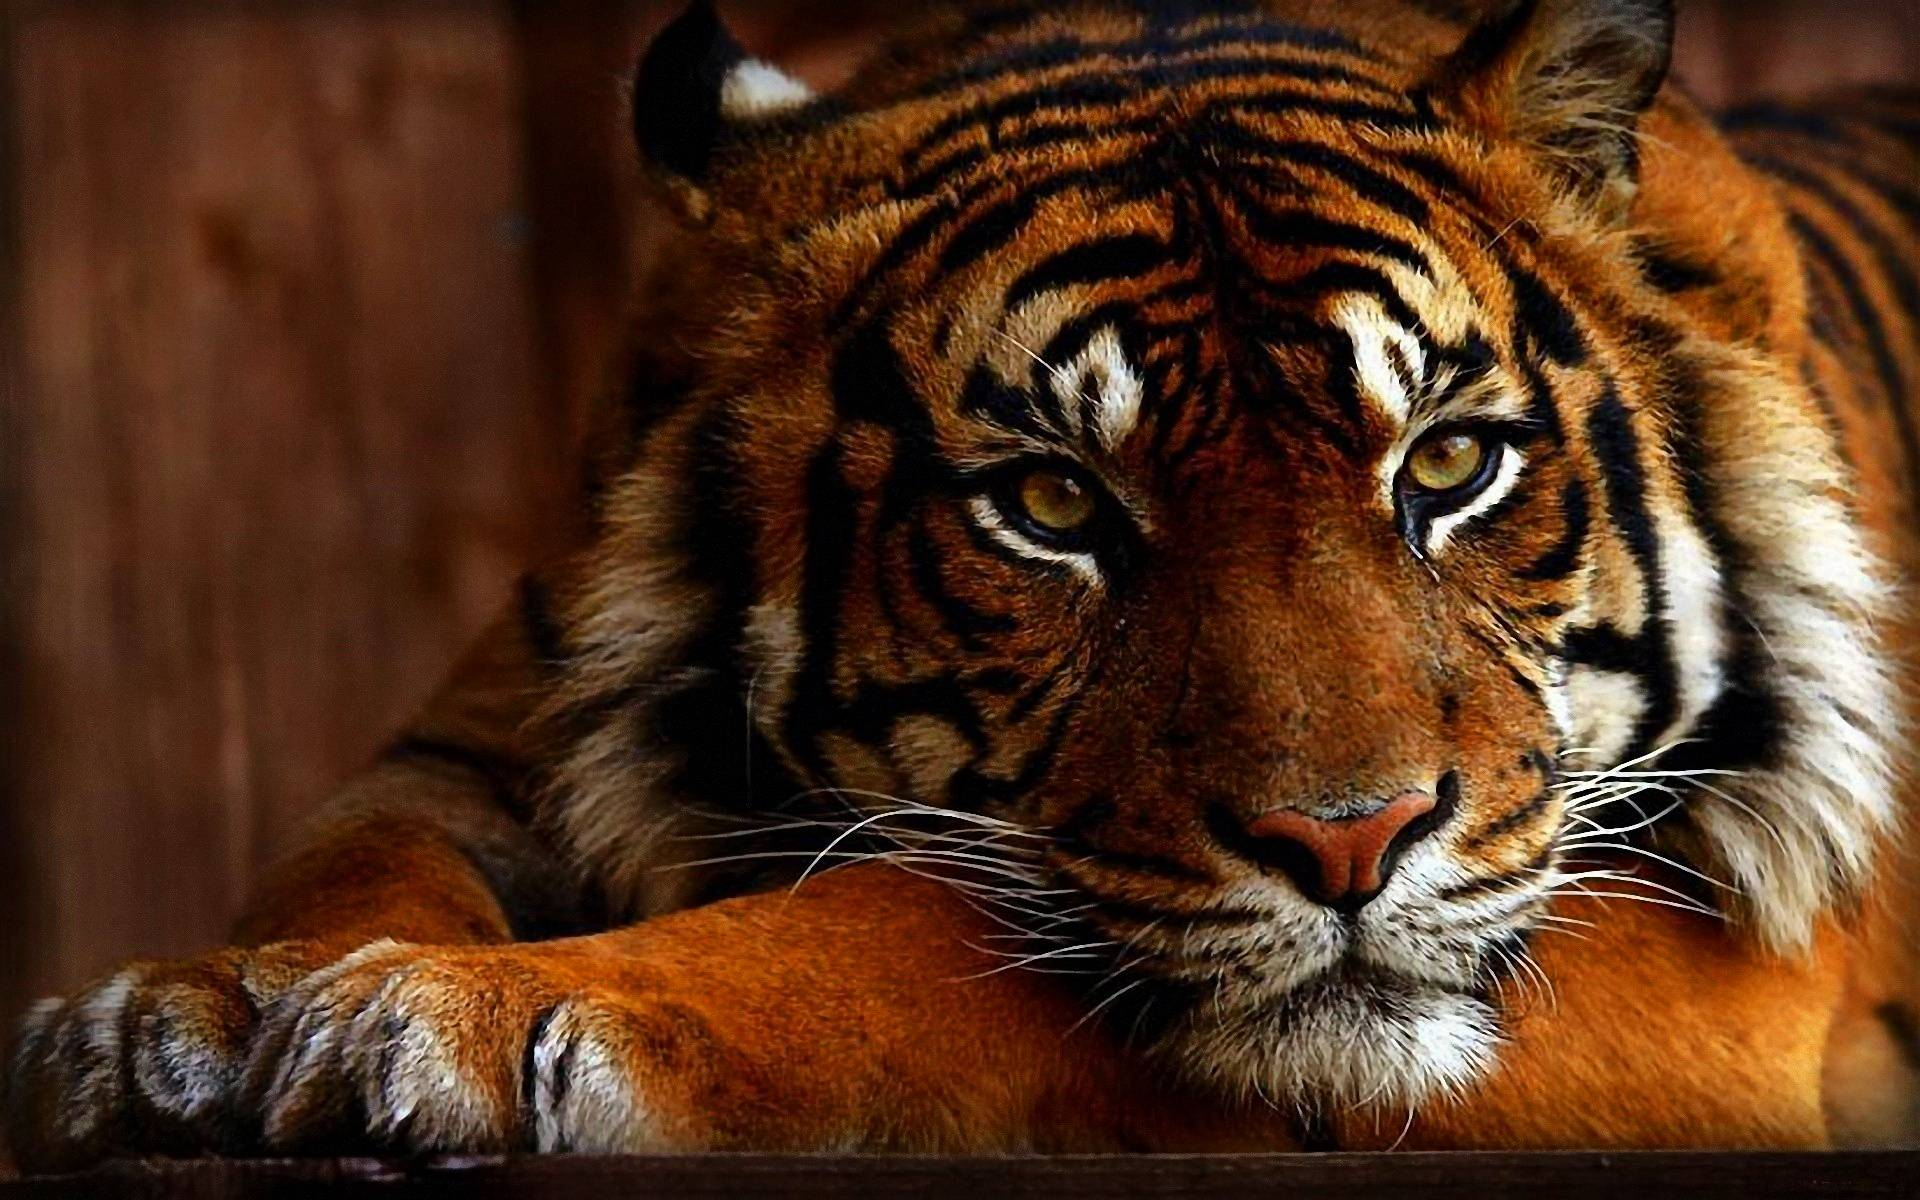 Wallpaper HD Tiger 73 172042 High Definition Wallpapers| wallalay.